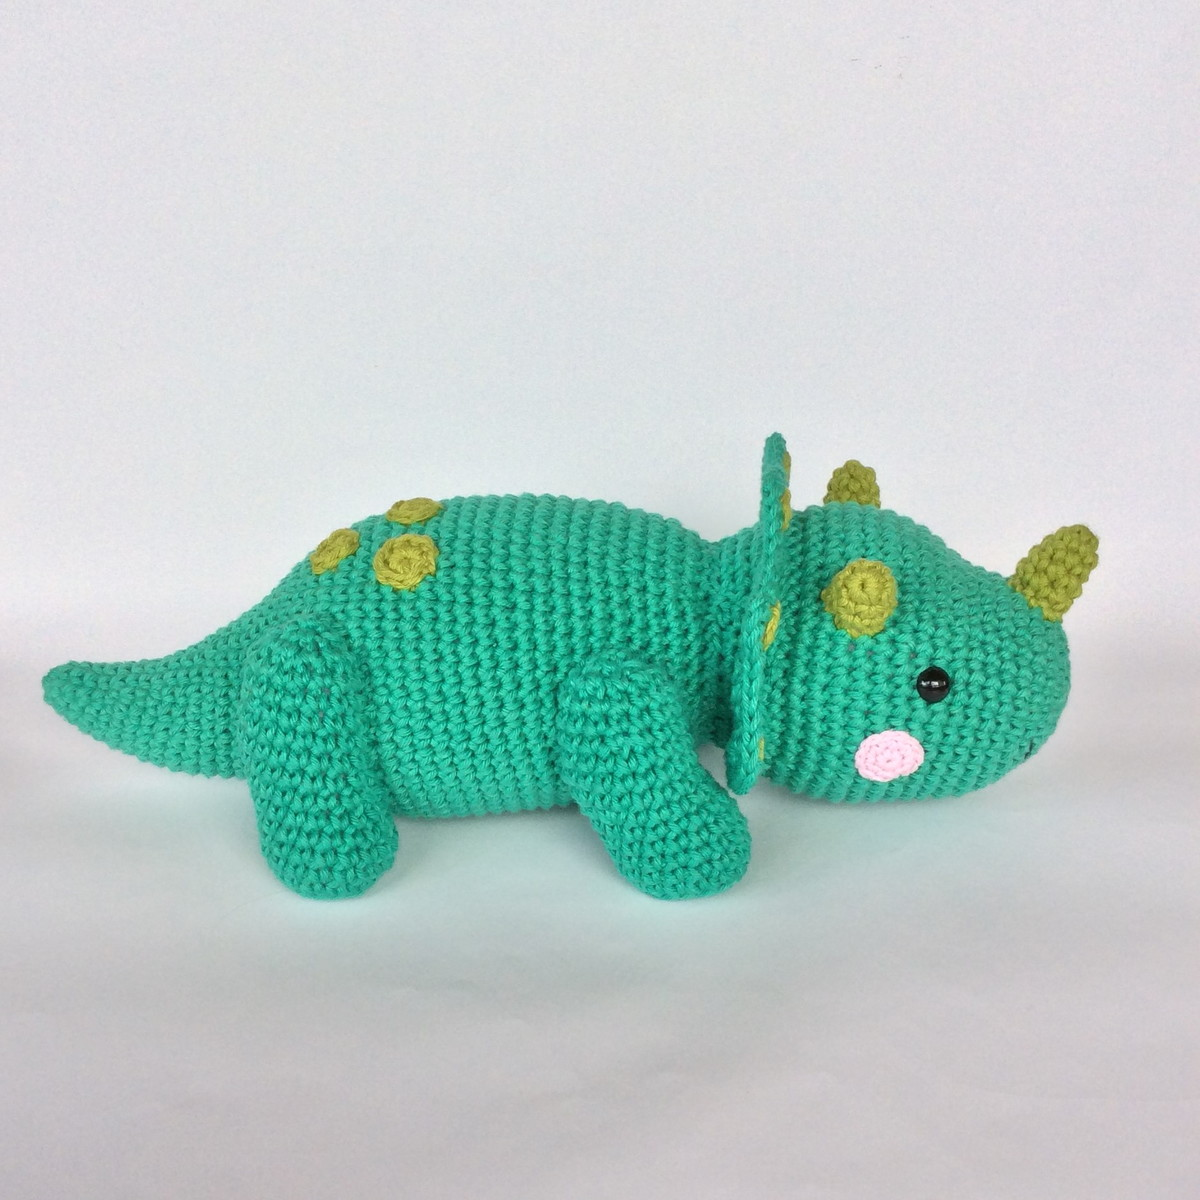 Bichinhos Amigurumi   Amigurumi de animais de crochê, Bichinhos de ...   1200x1200